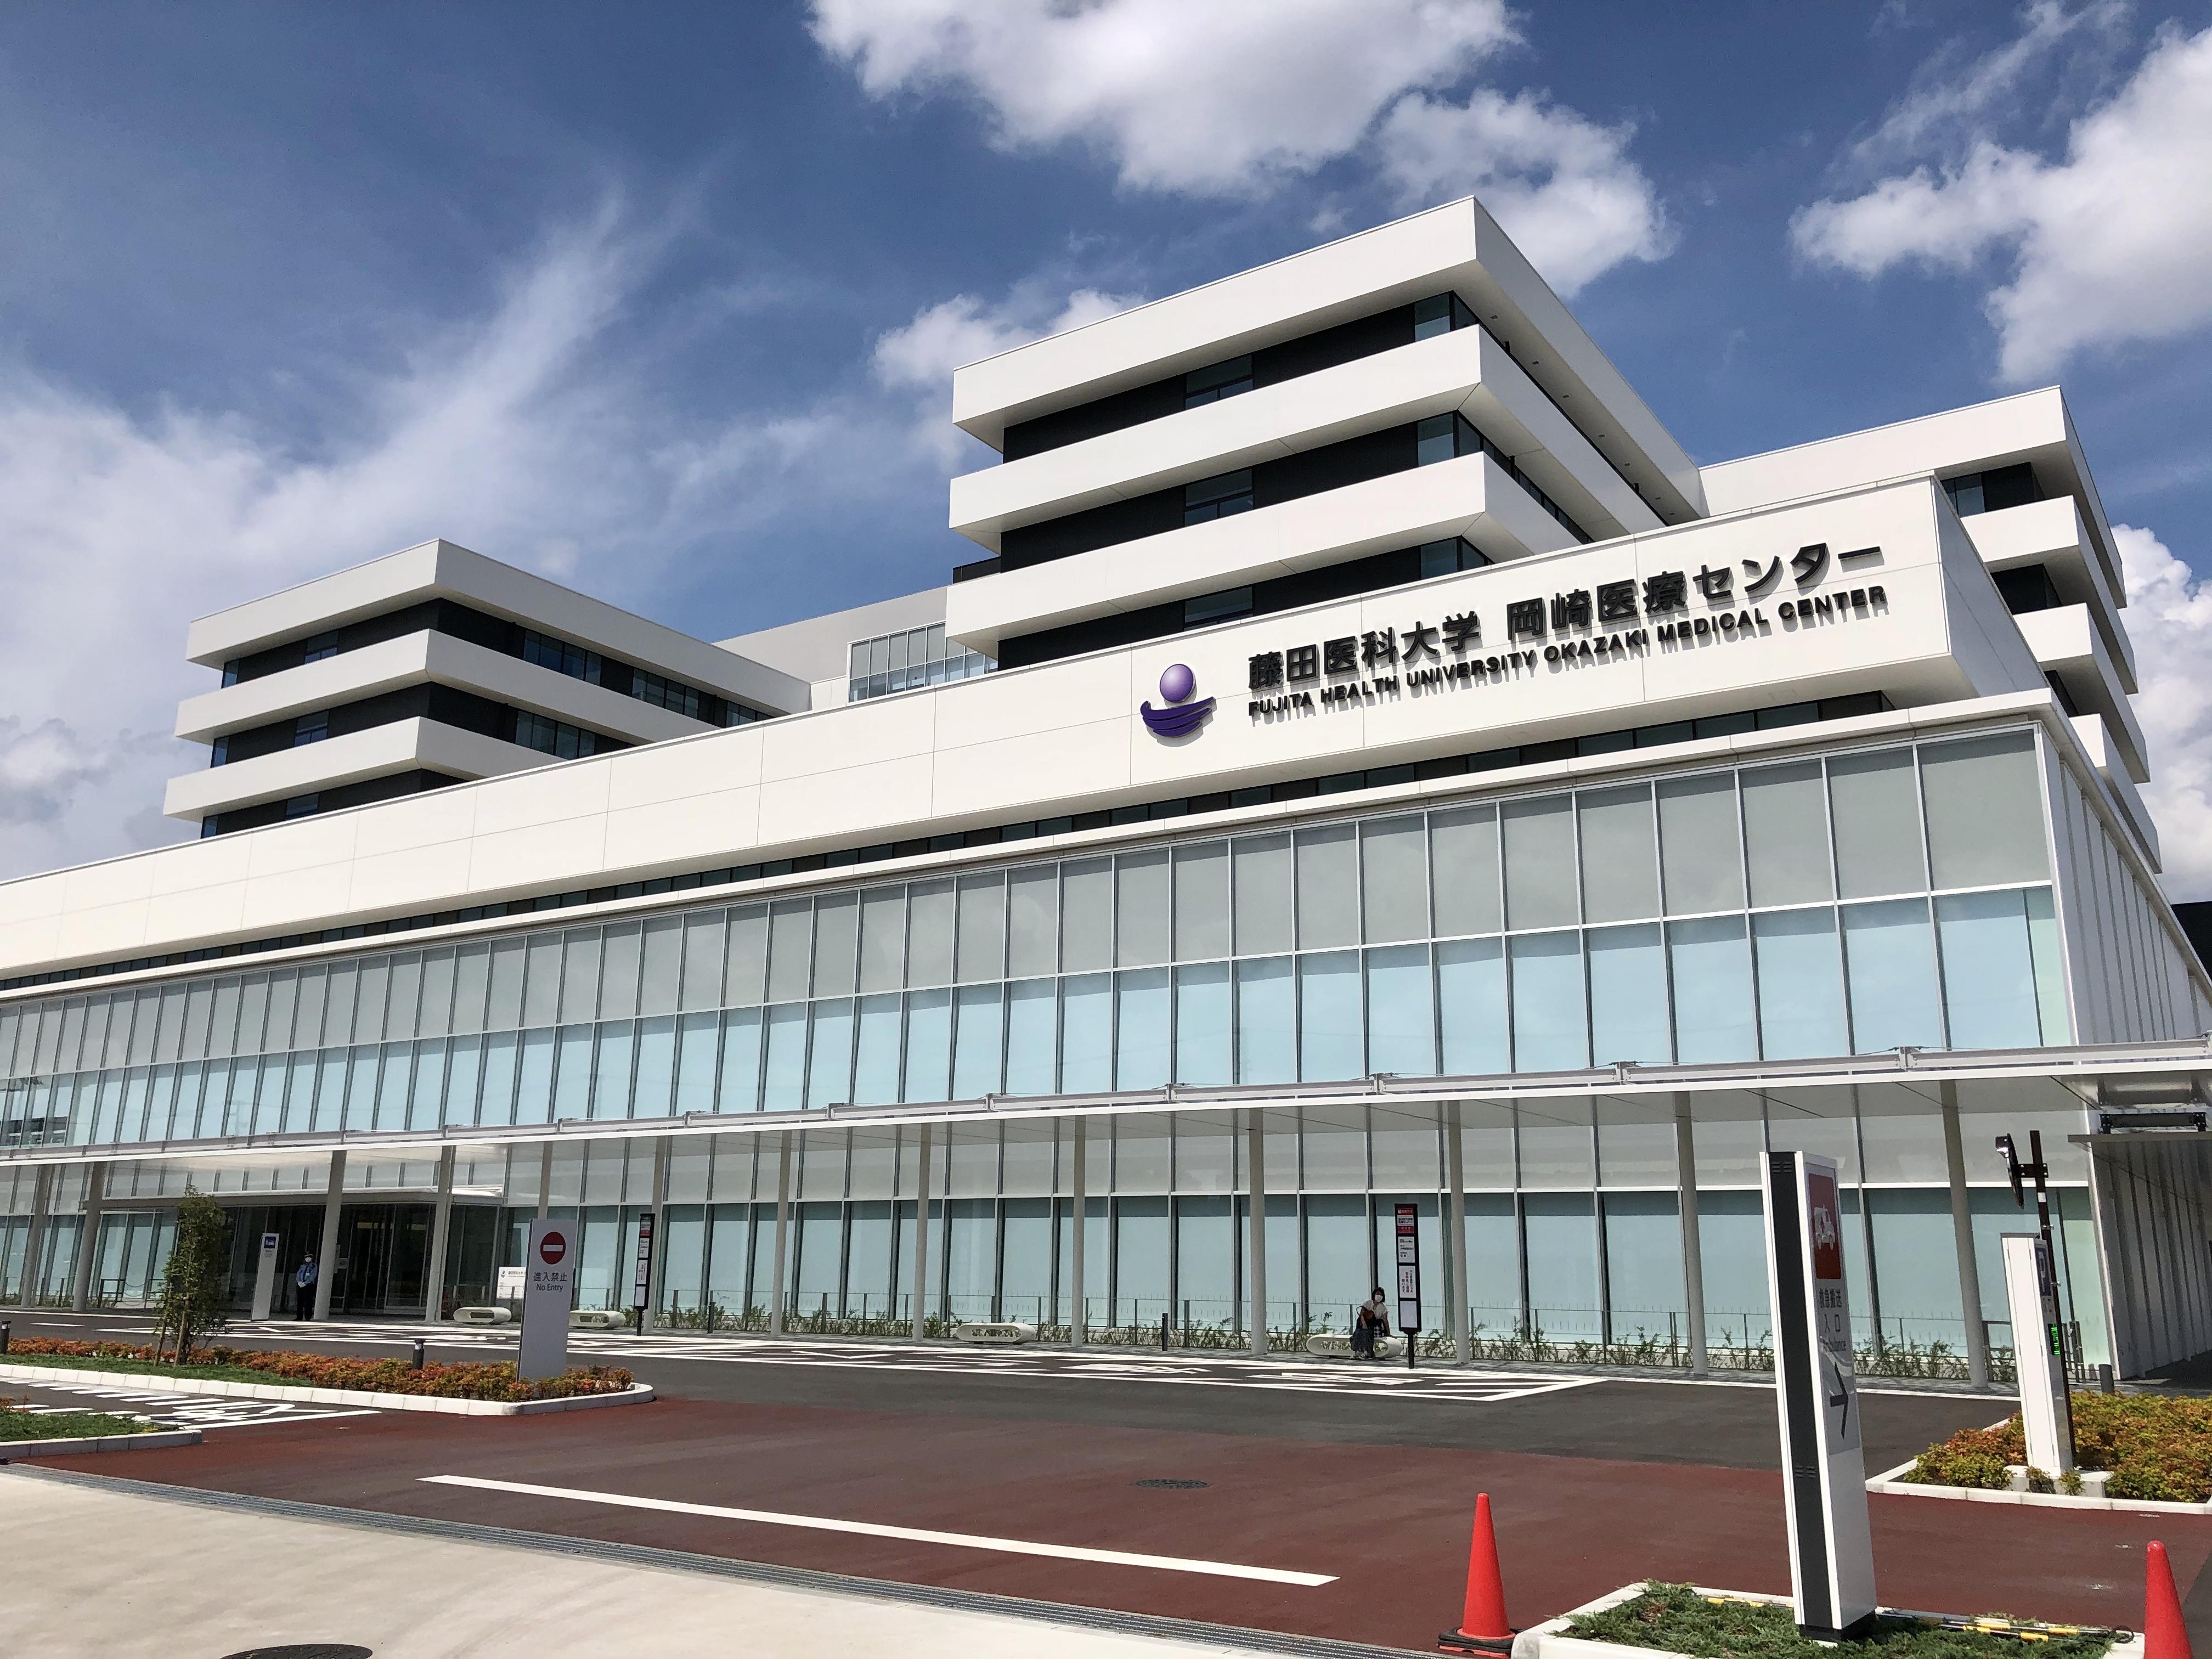 医科 病院 藤田 医療 センター 岡崎 大学